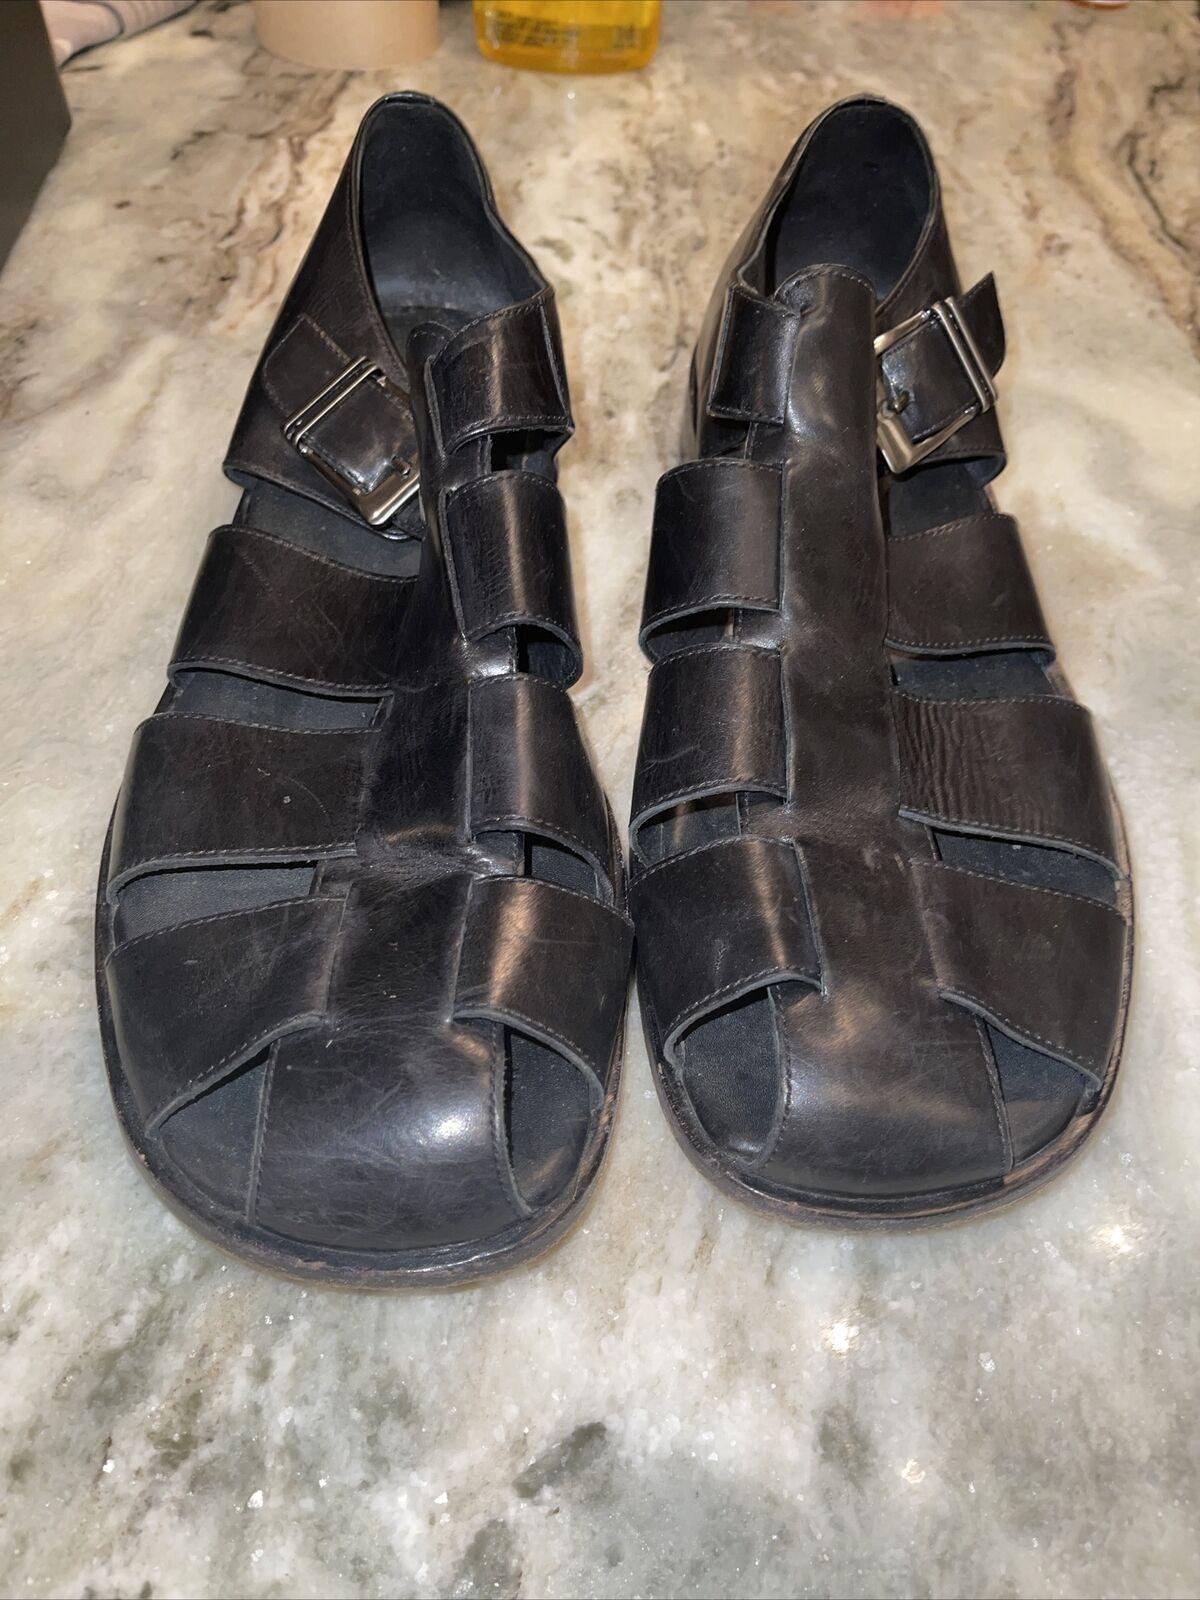 Johnston & Murphy Fisherman Leather Sandals shoes 1388 Black Men's Size 13 M EUC